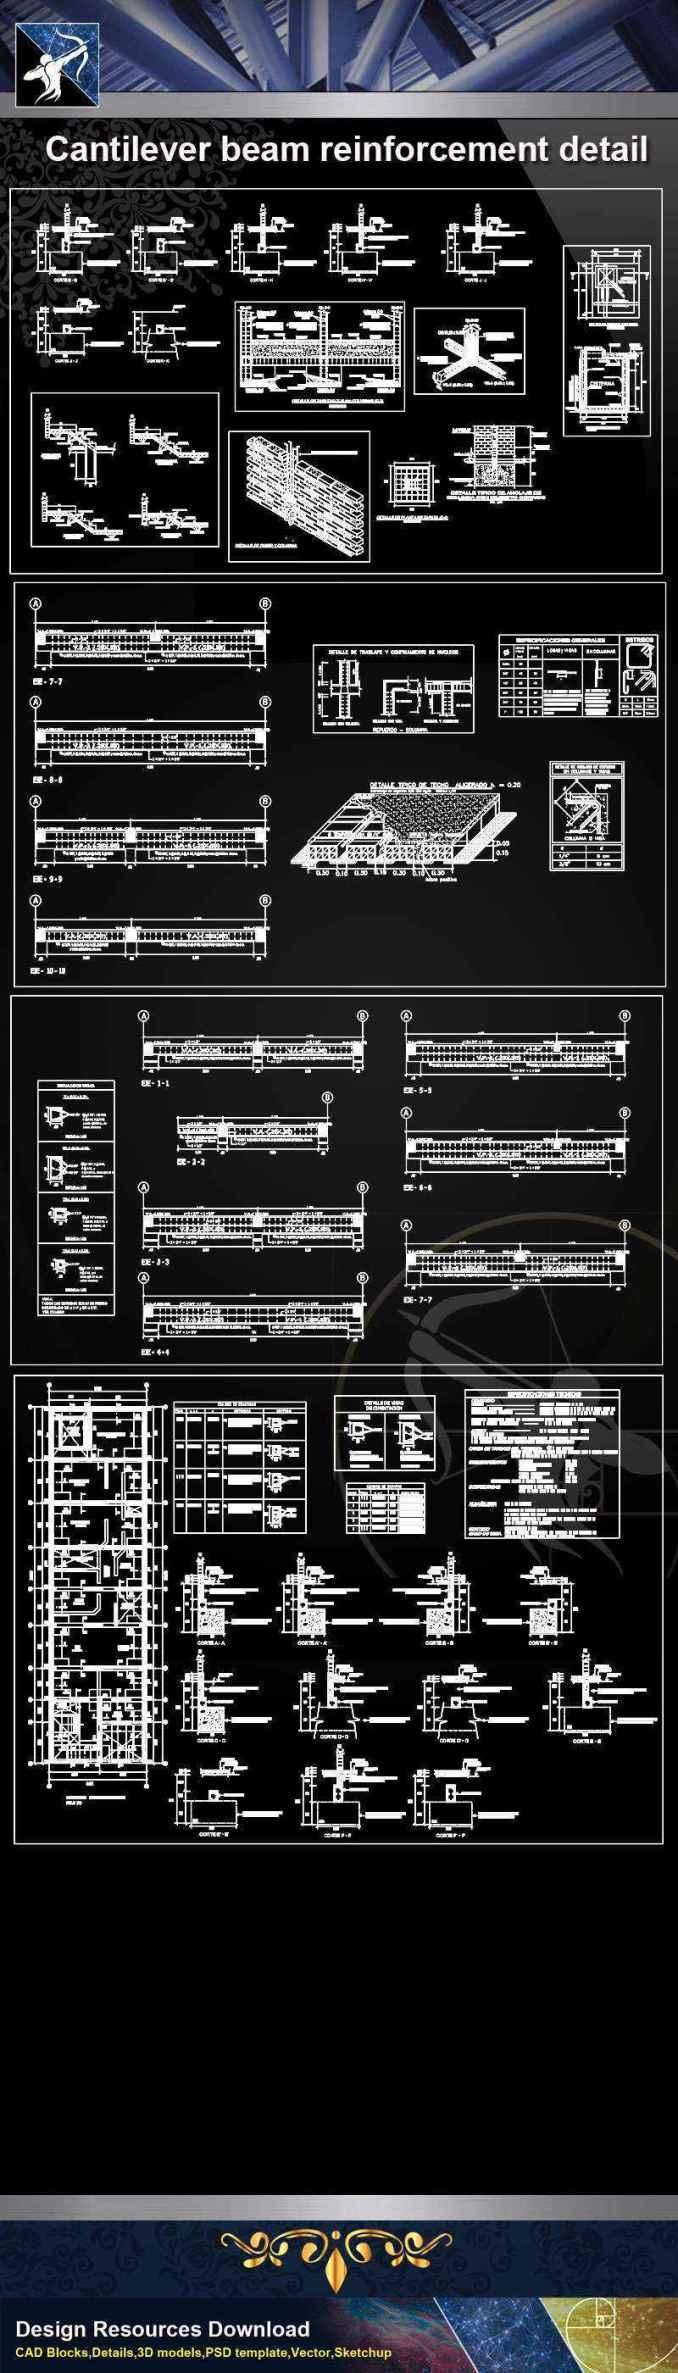 Cantilever beam reinforcement CAD Details